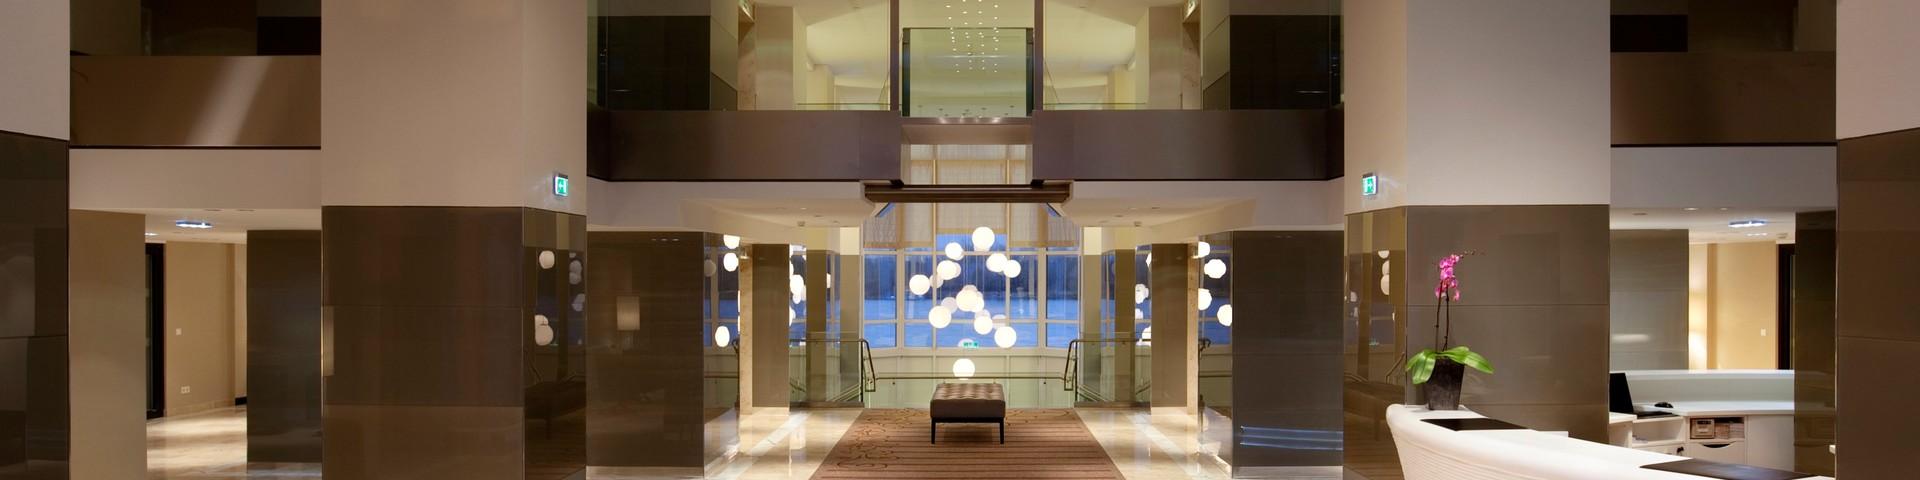 Hilton Vienna Danube Waterfront - Lobby © Hilton Danube Waterfront